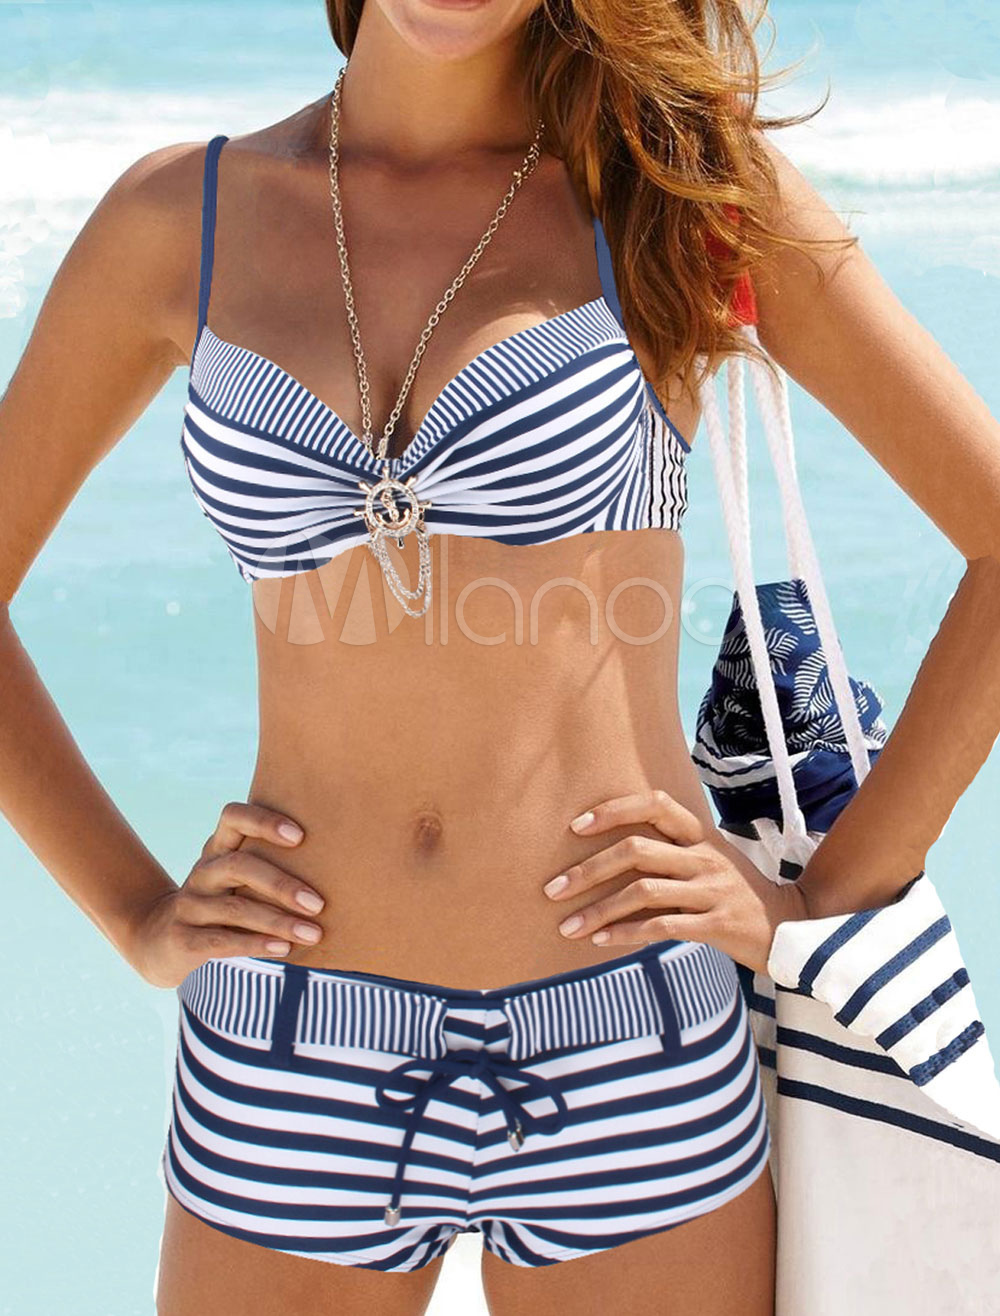 2 Piece Swimsuit Dark Navy Spaghetti Straps Sleeveless Striped Bikini Top With High Waist Panties